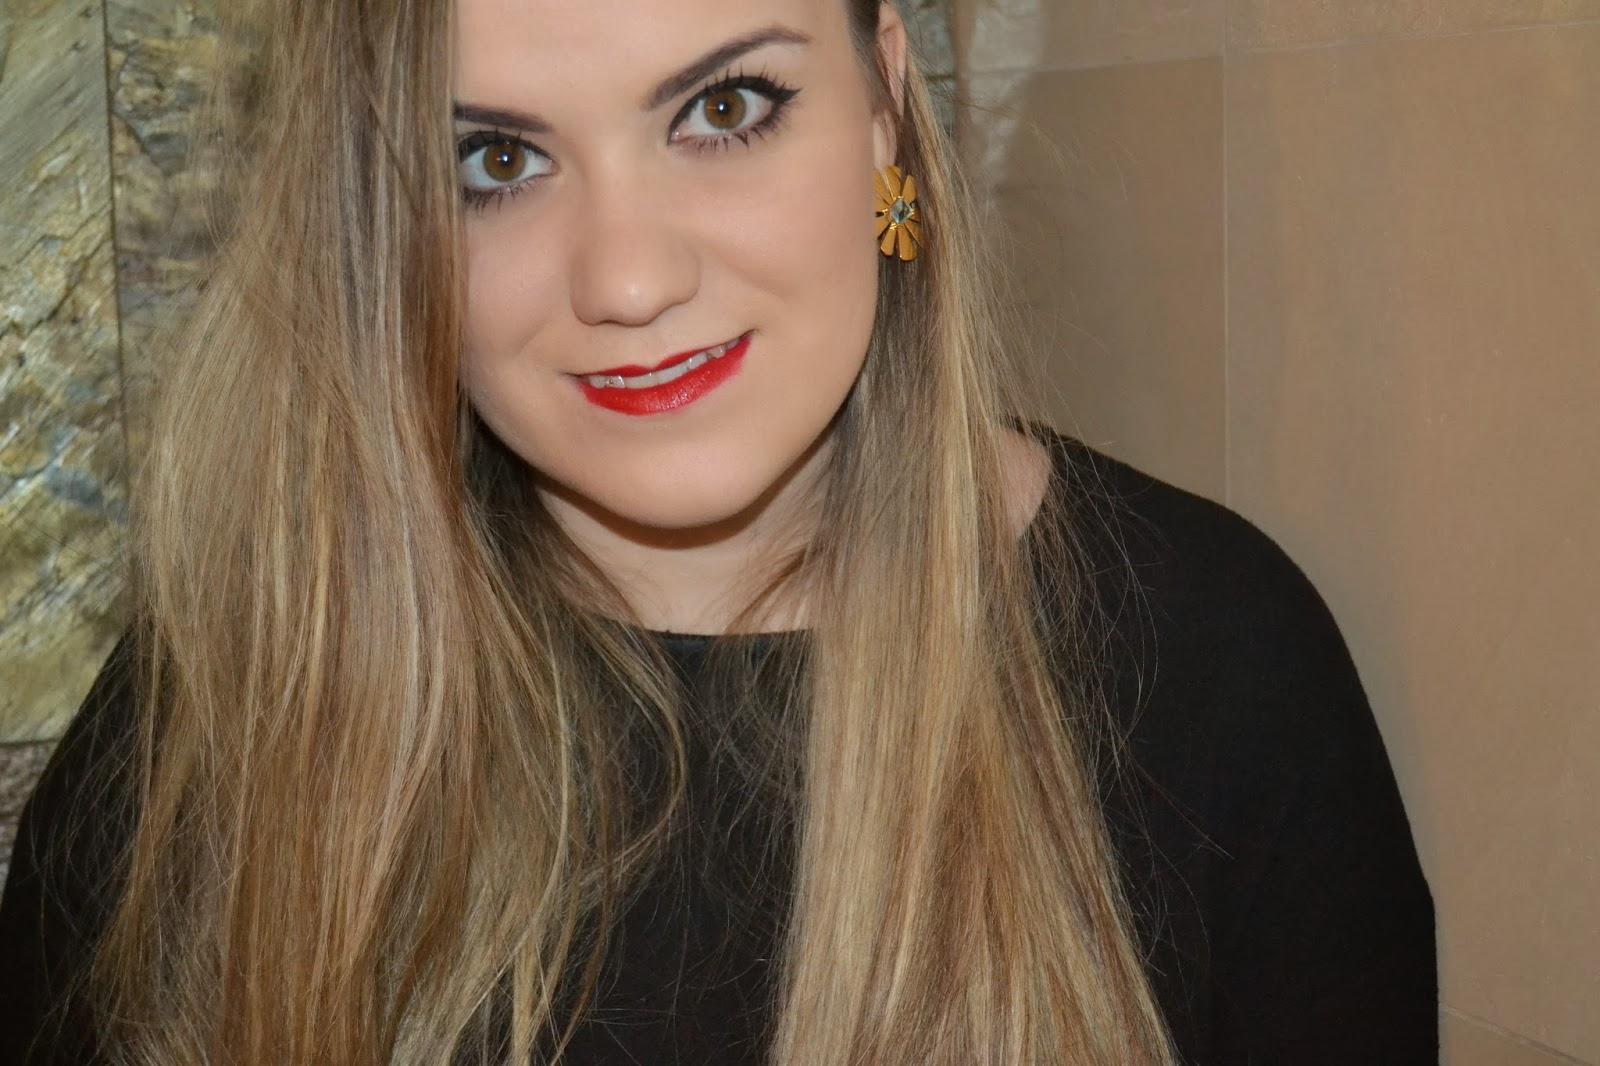 Peinados Faciles Para Noche Vieja - Peinados para nochevieja 20 recogidos para brillar TELVA